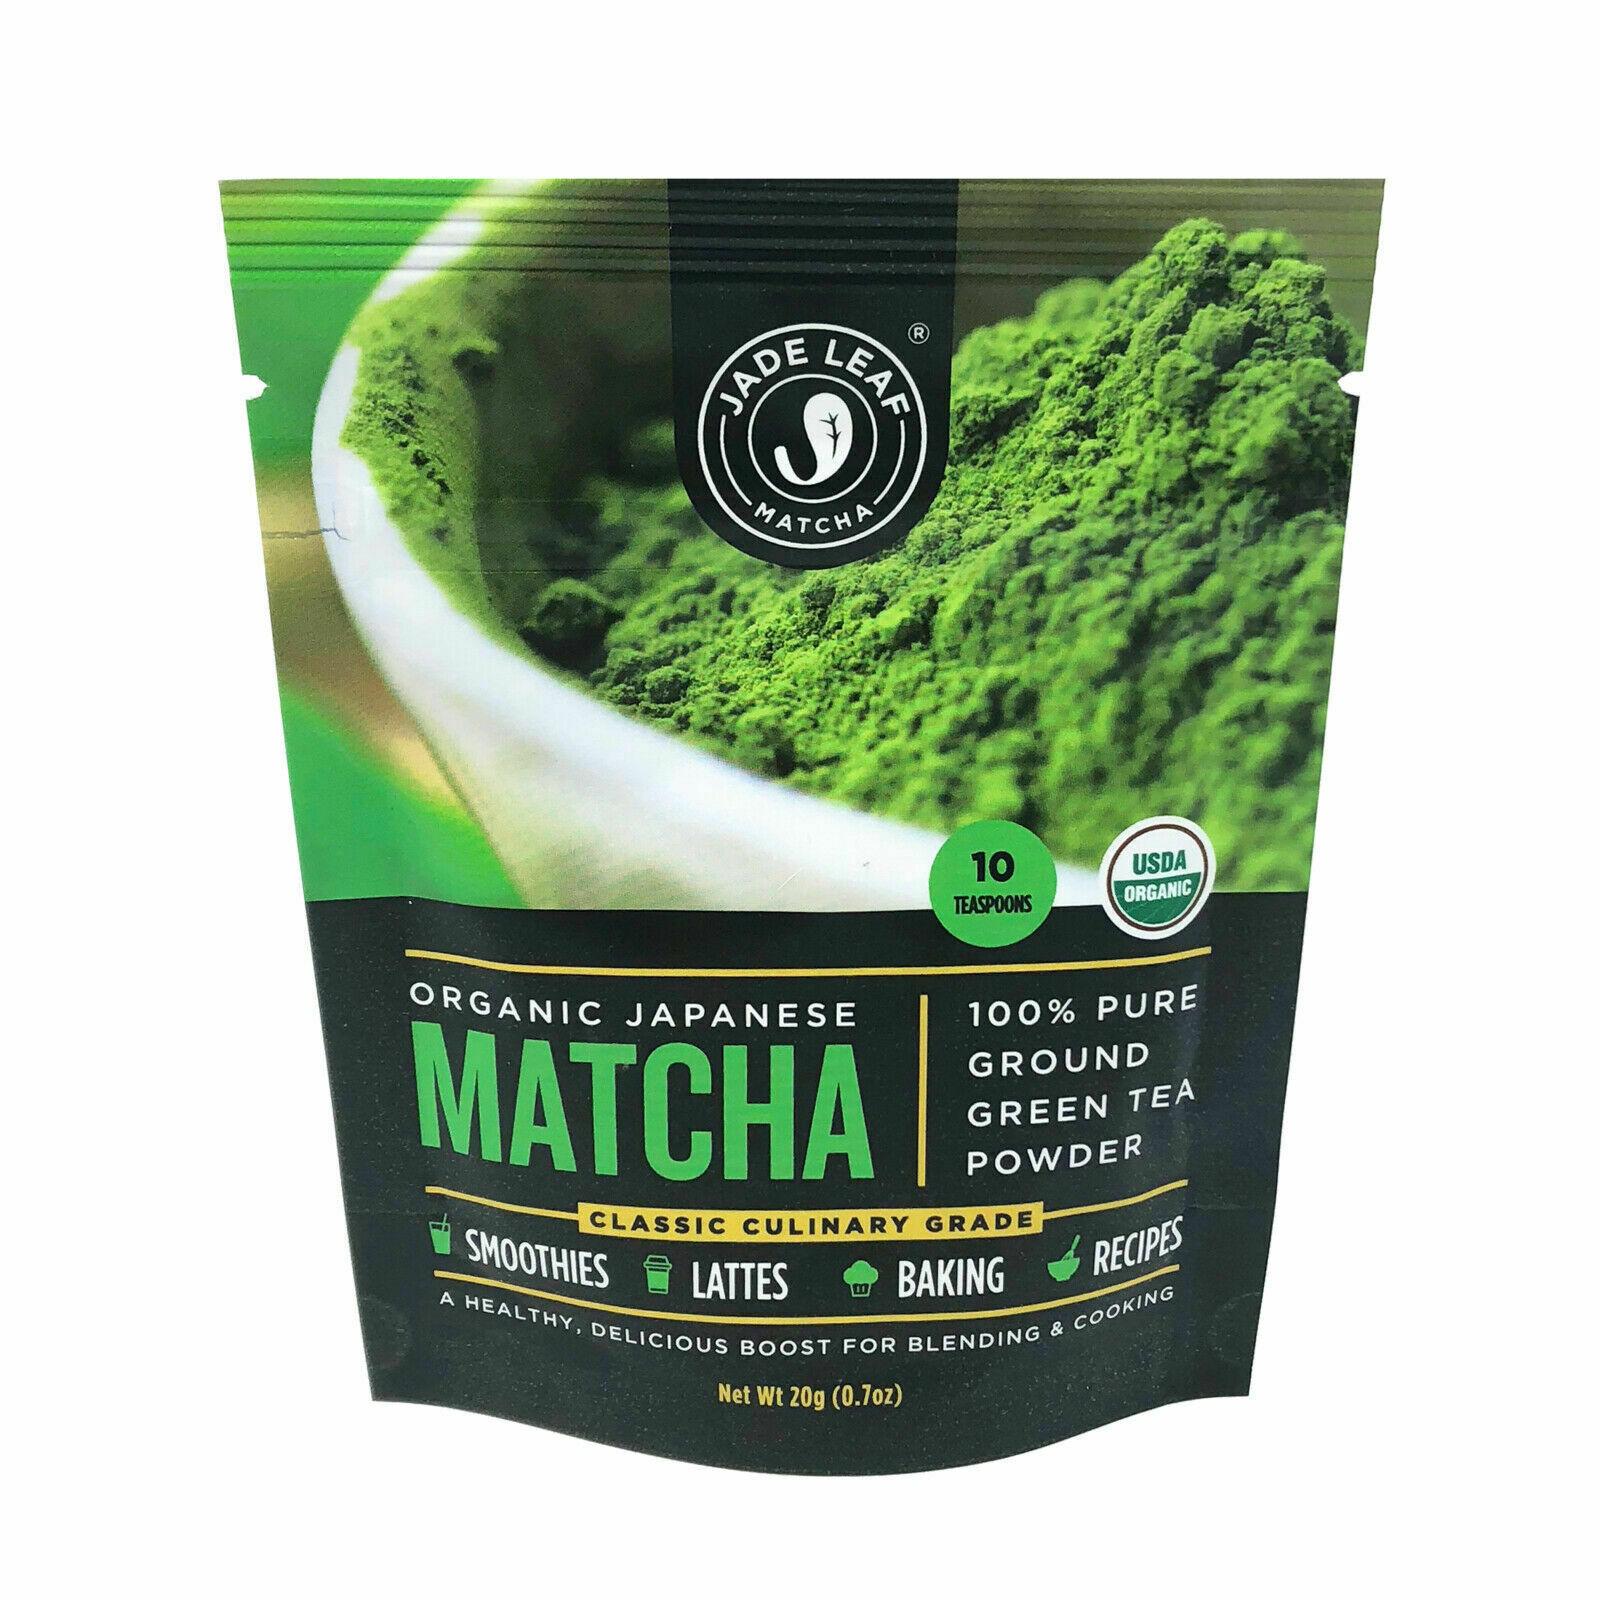 Jade Leaf Matcha, Organic Japanese Culinary Grade, Powdered Tea,  0.7 Oz